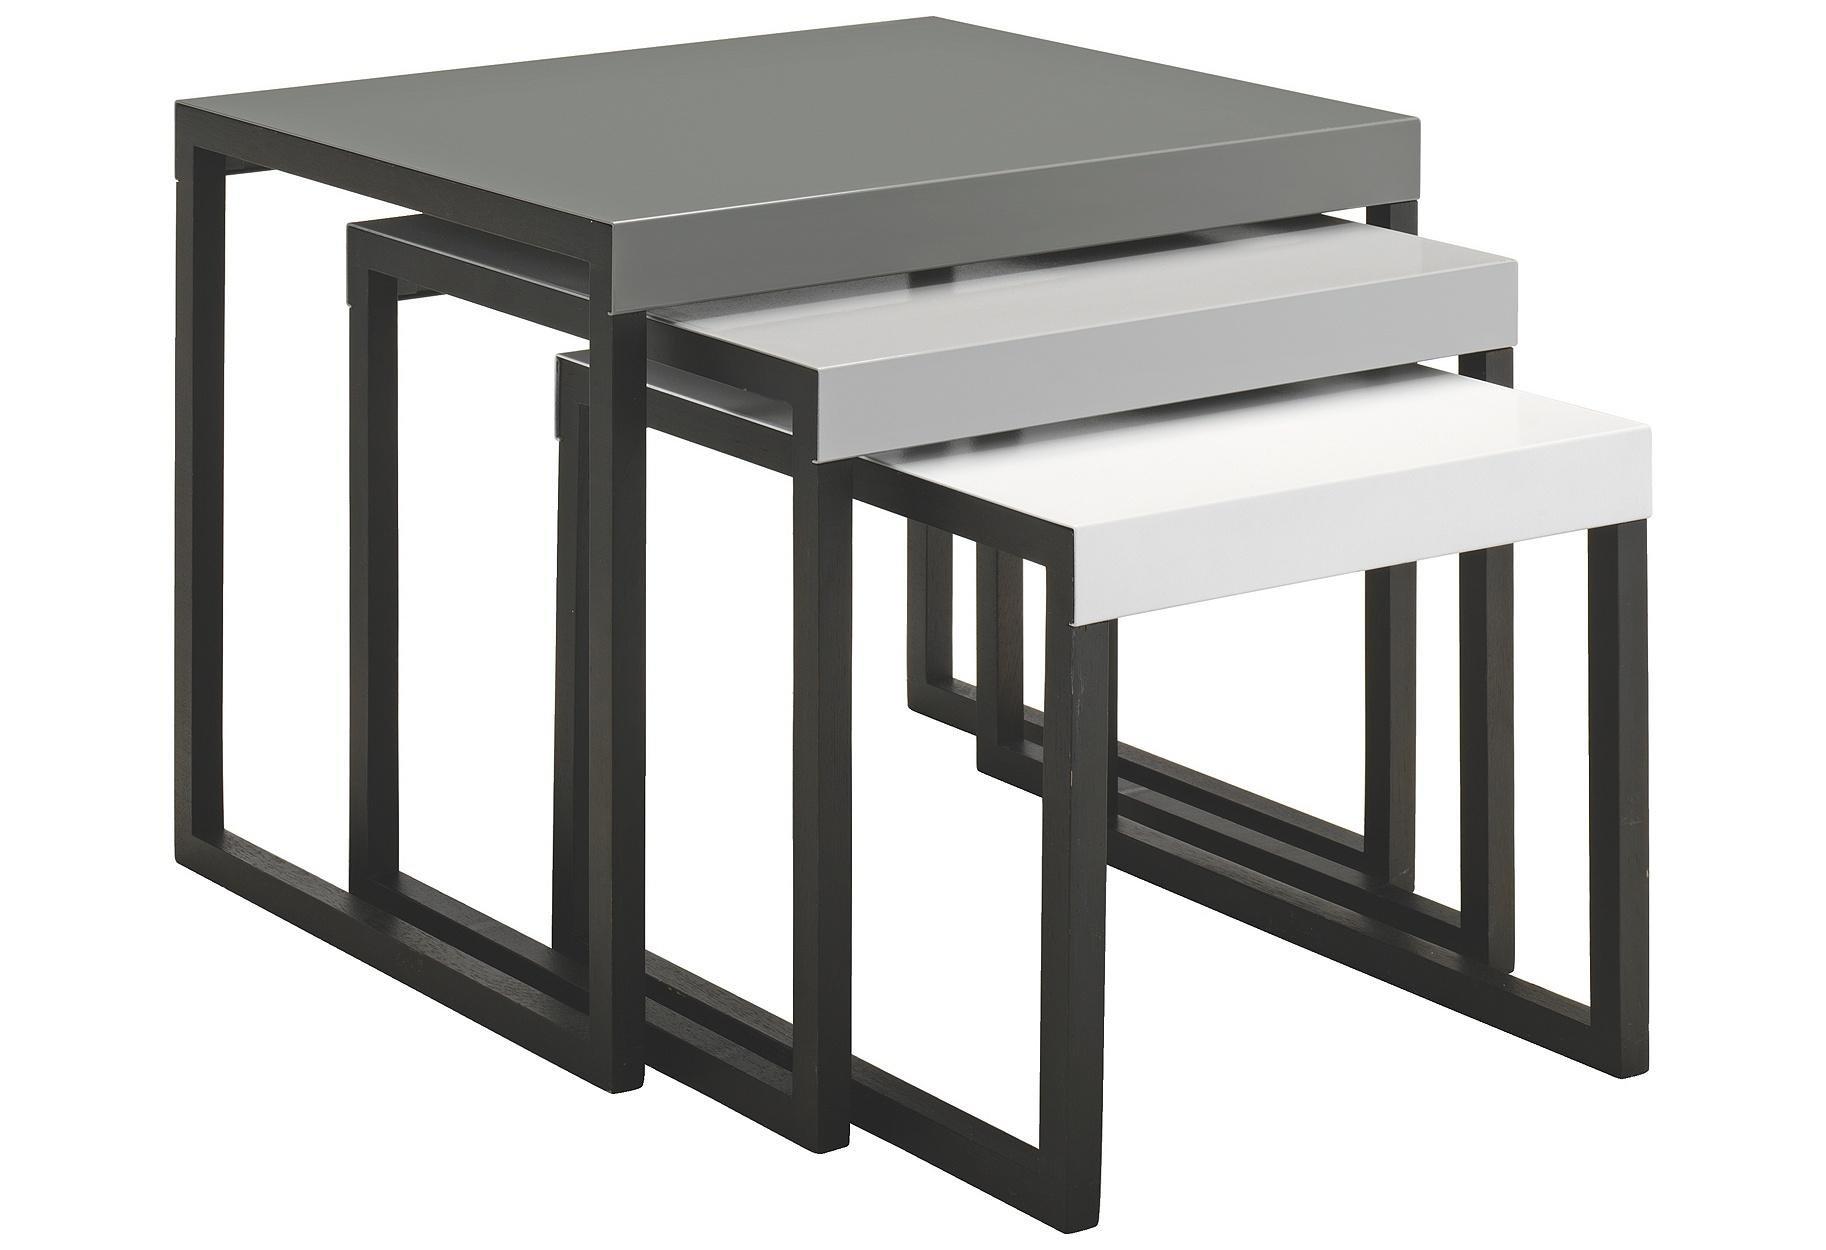 Habitat Kilo Metal Nest of Tables Grey